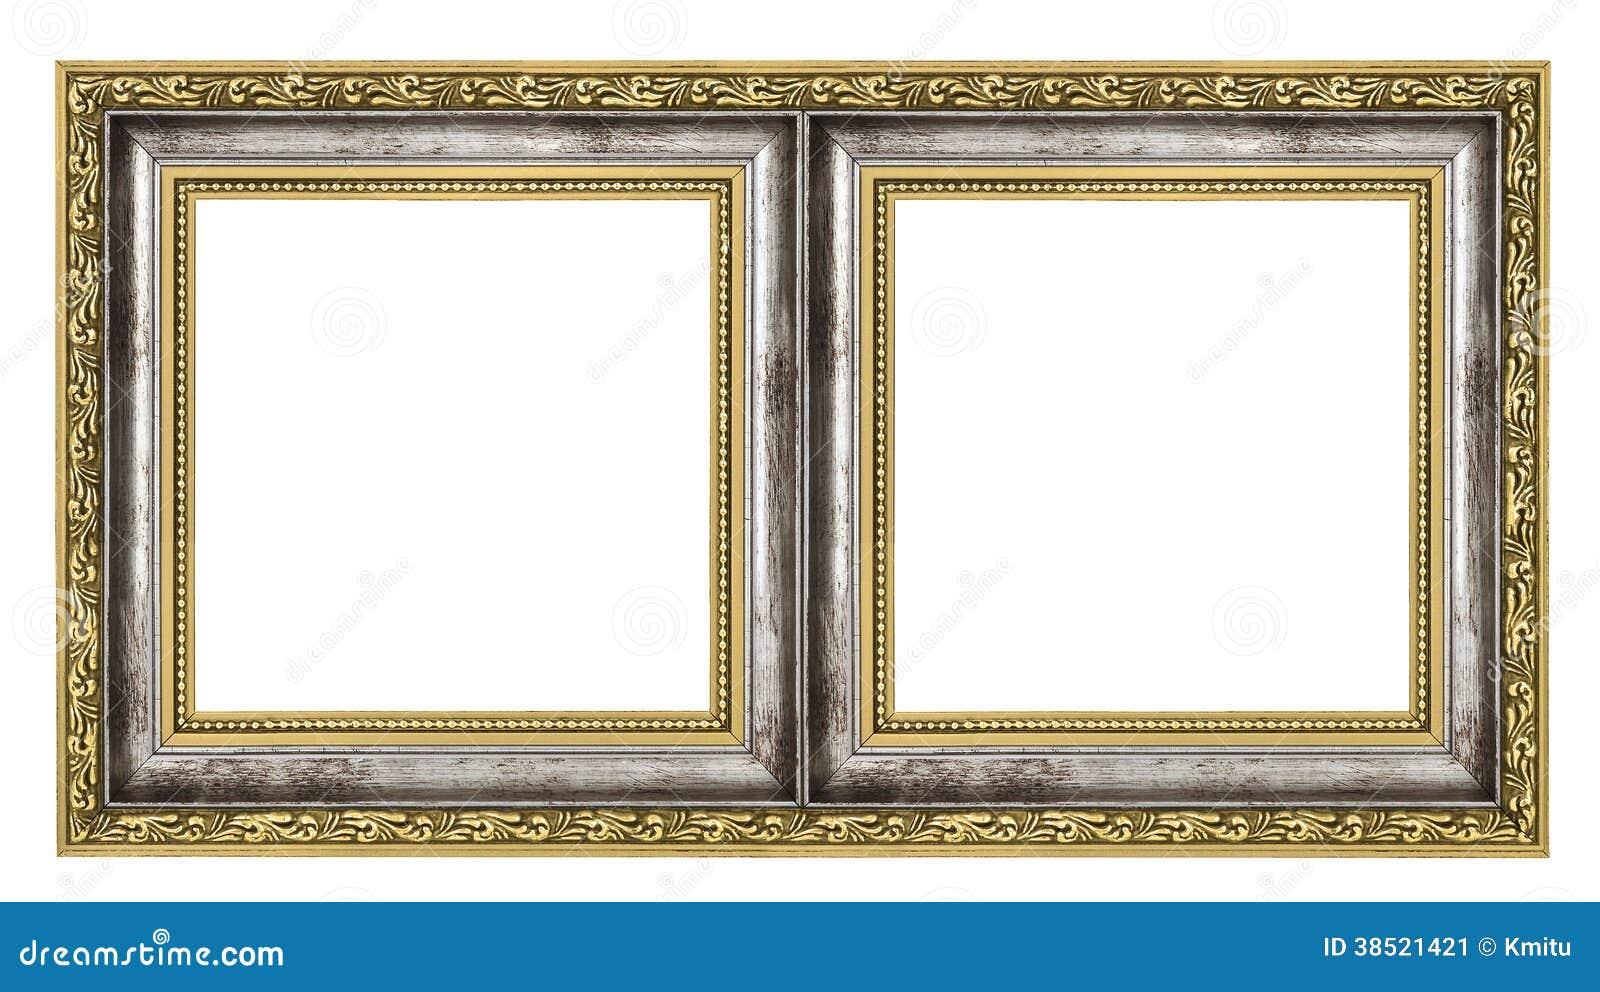 dual frame stock image image of handicraft curious 38521421. Black Bedroom Furniture Sets. Home Design Ideas